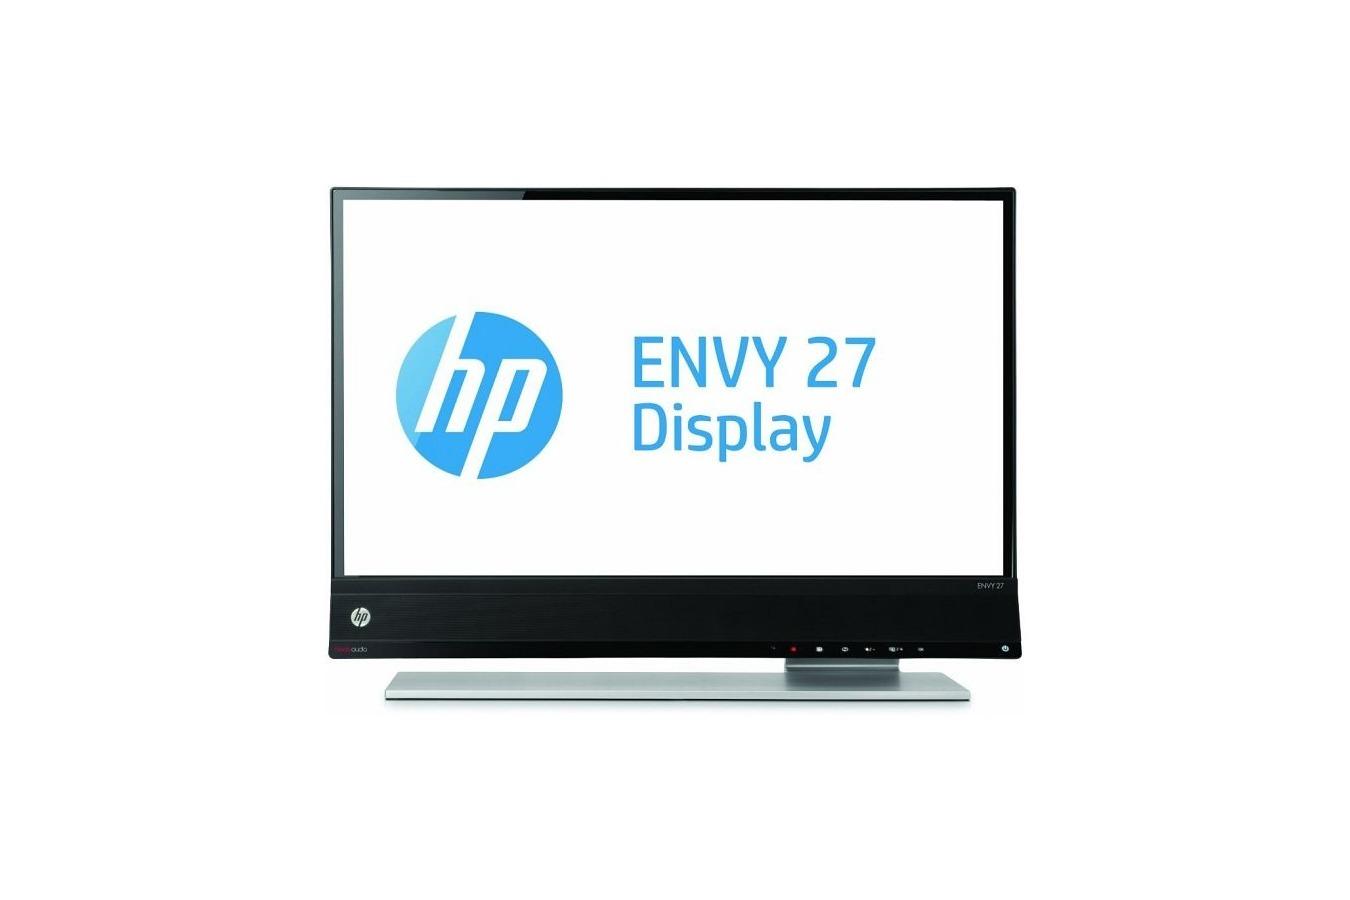 "Monitor Display HP Envy 27 68.58 cm 27"" FHD IPS LED Backlit (C8K32AA)"